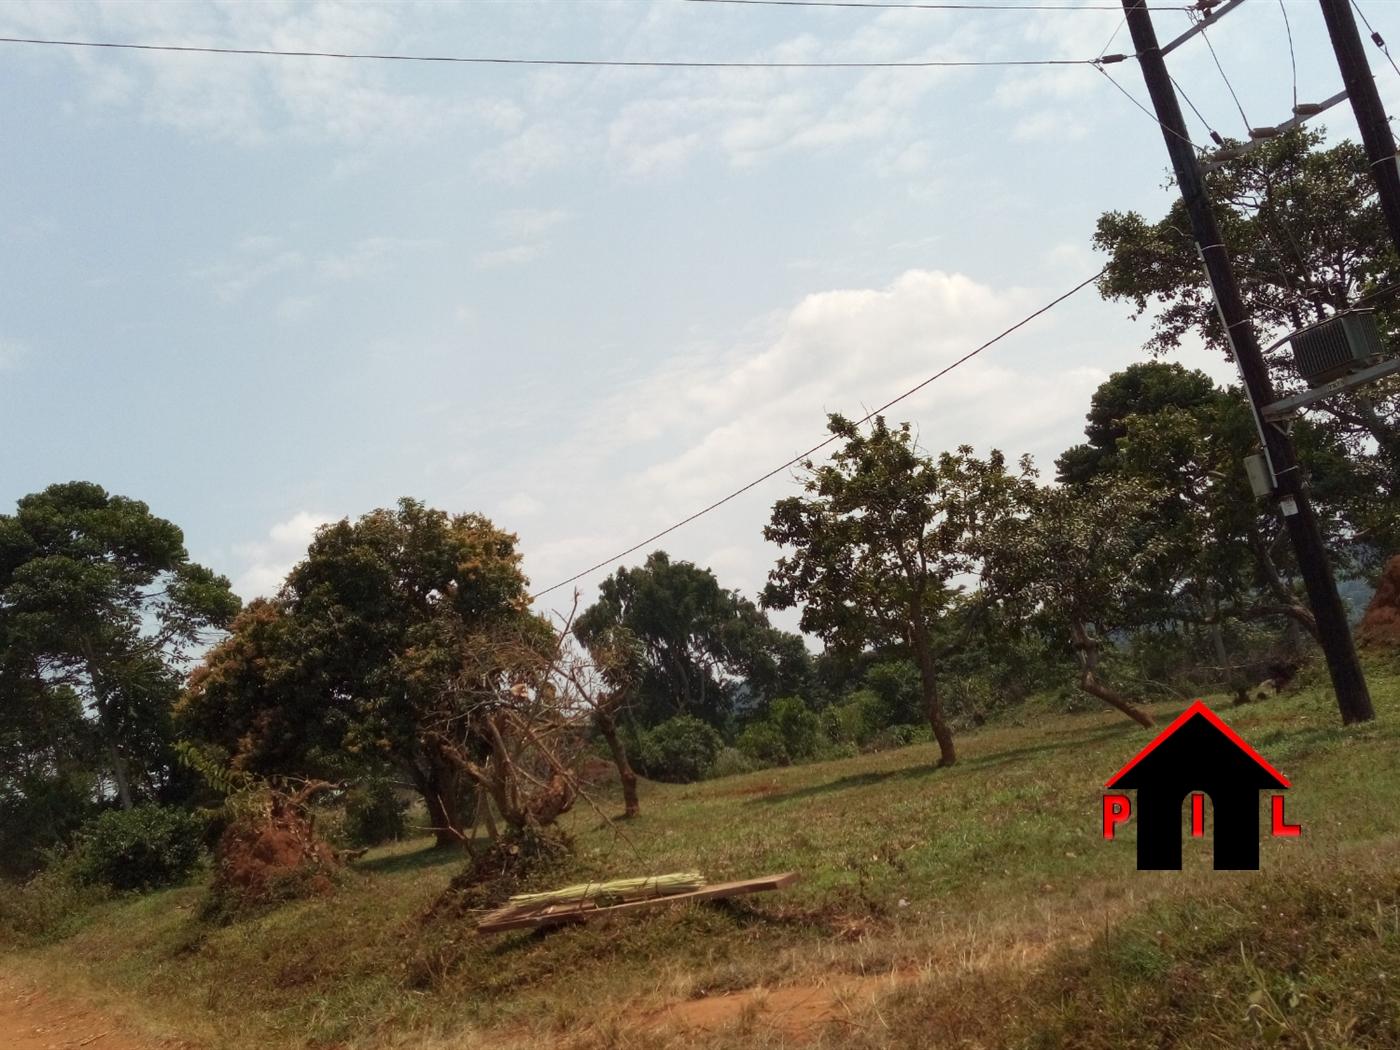 Residential Land for sale in Buyala Mityana